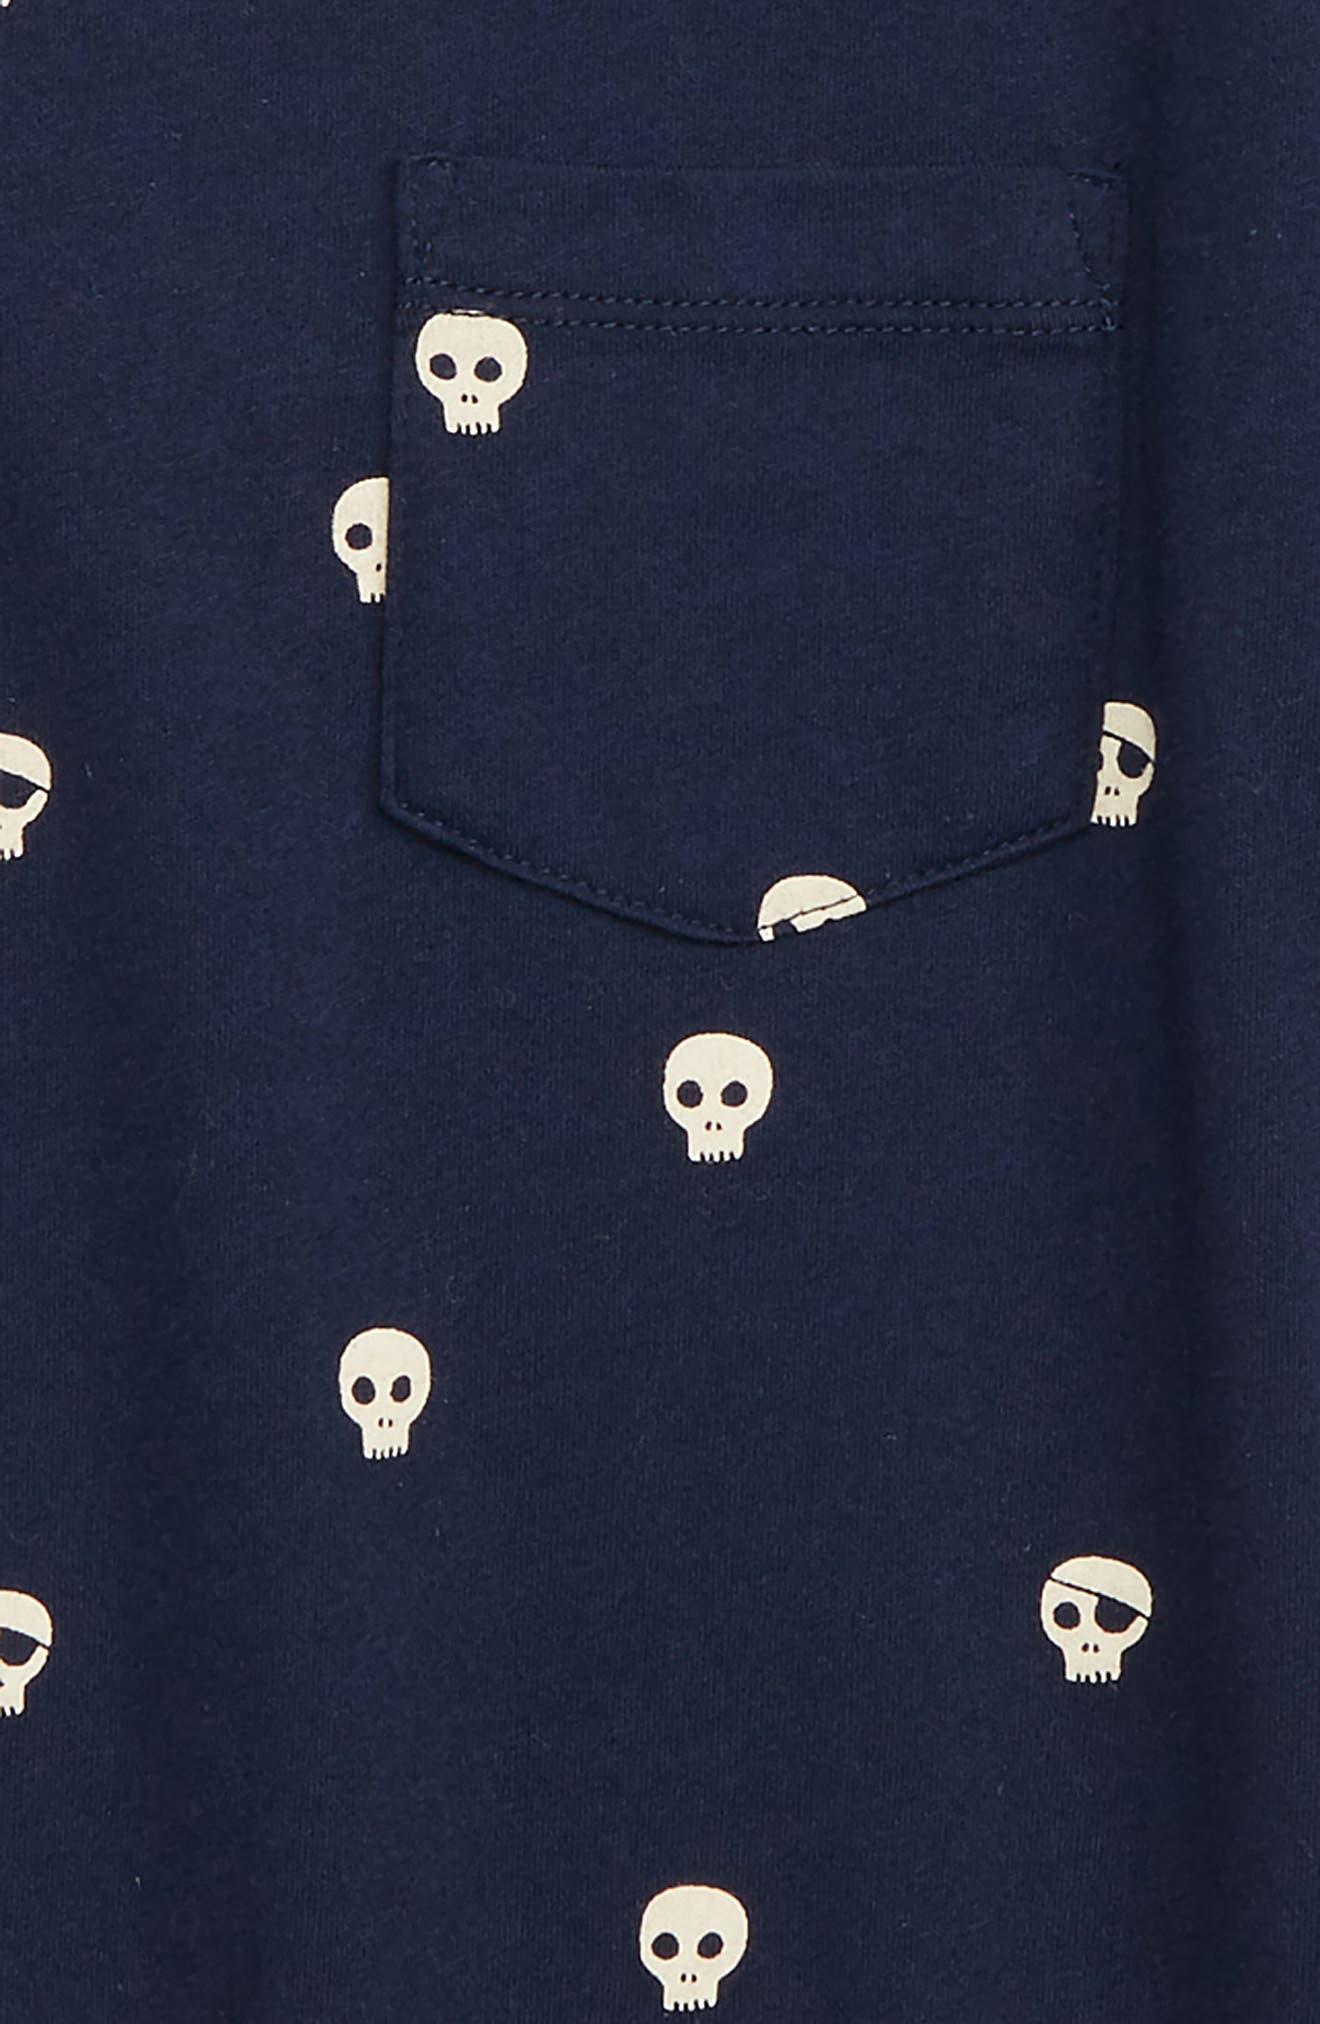 Pocket Glow in the Dark T-Shirt,                             Alternate thumbnail 2, color,                             NAVY